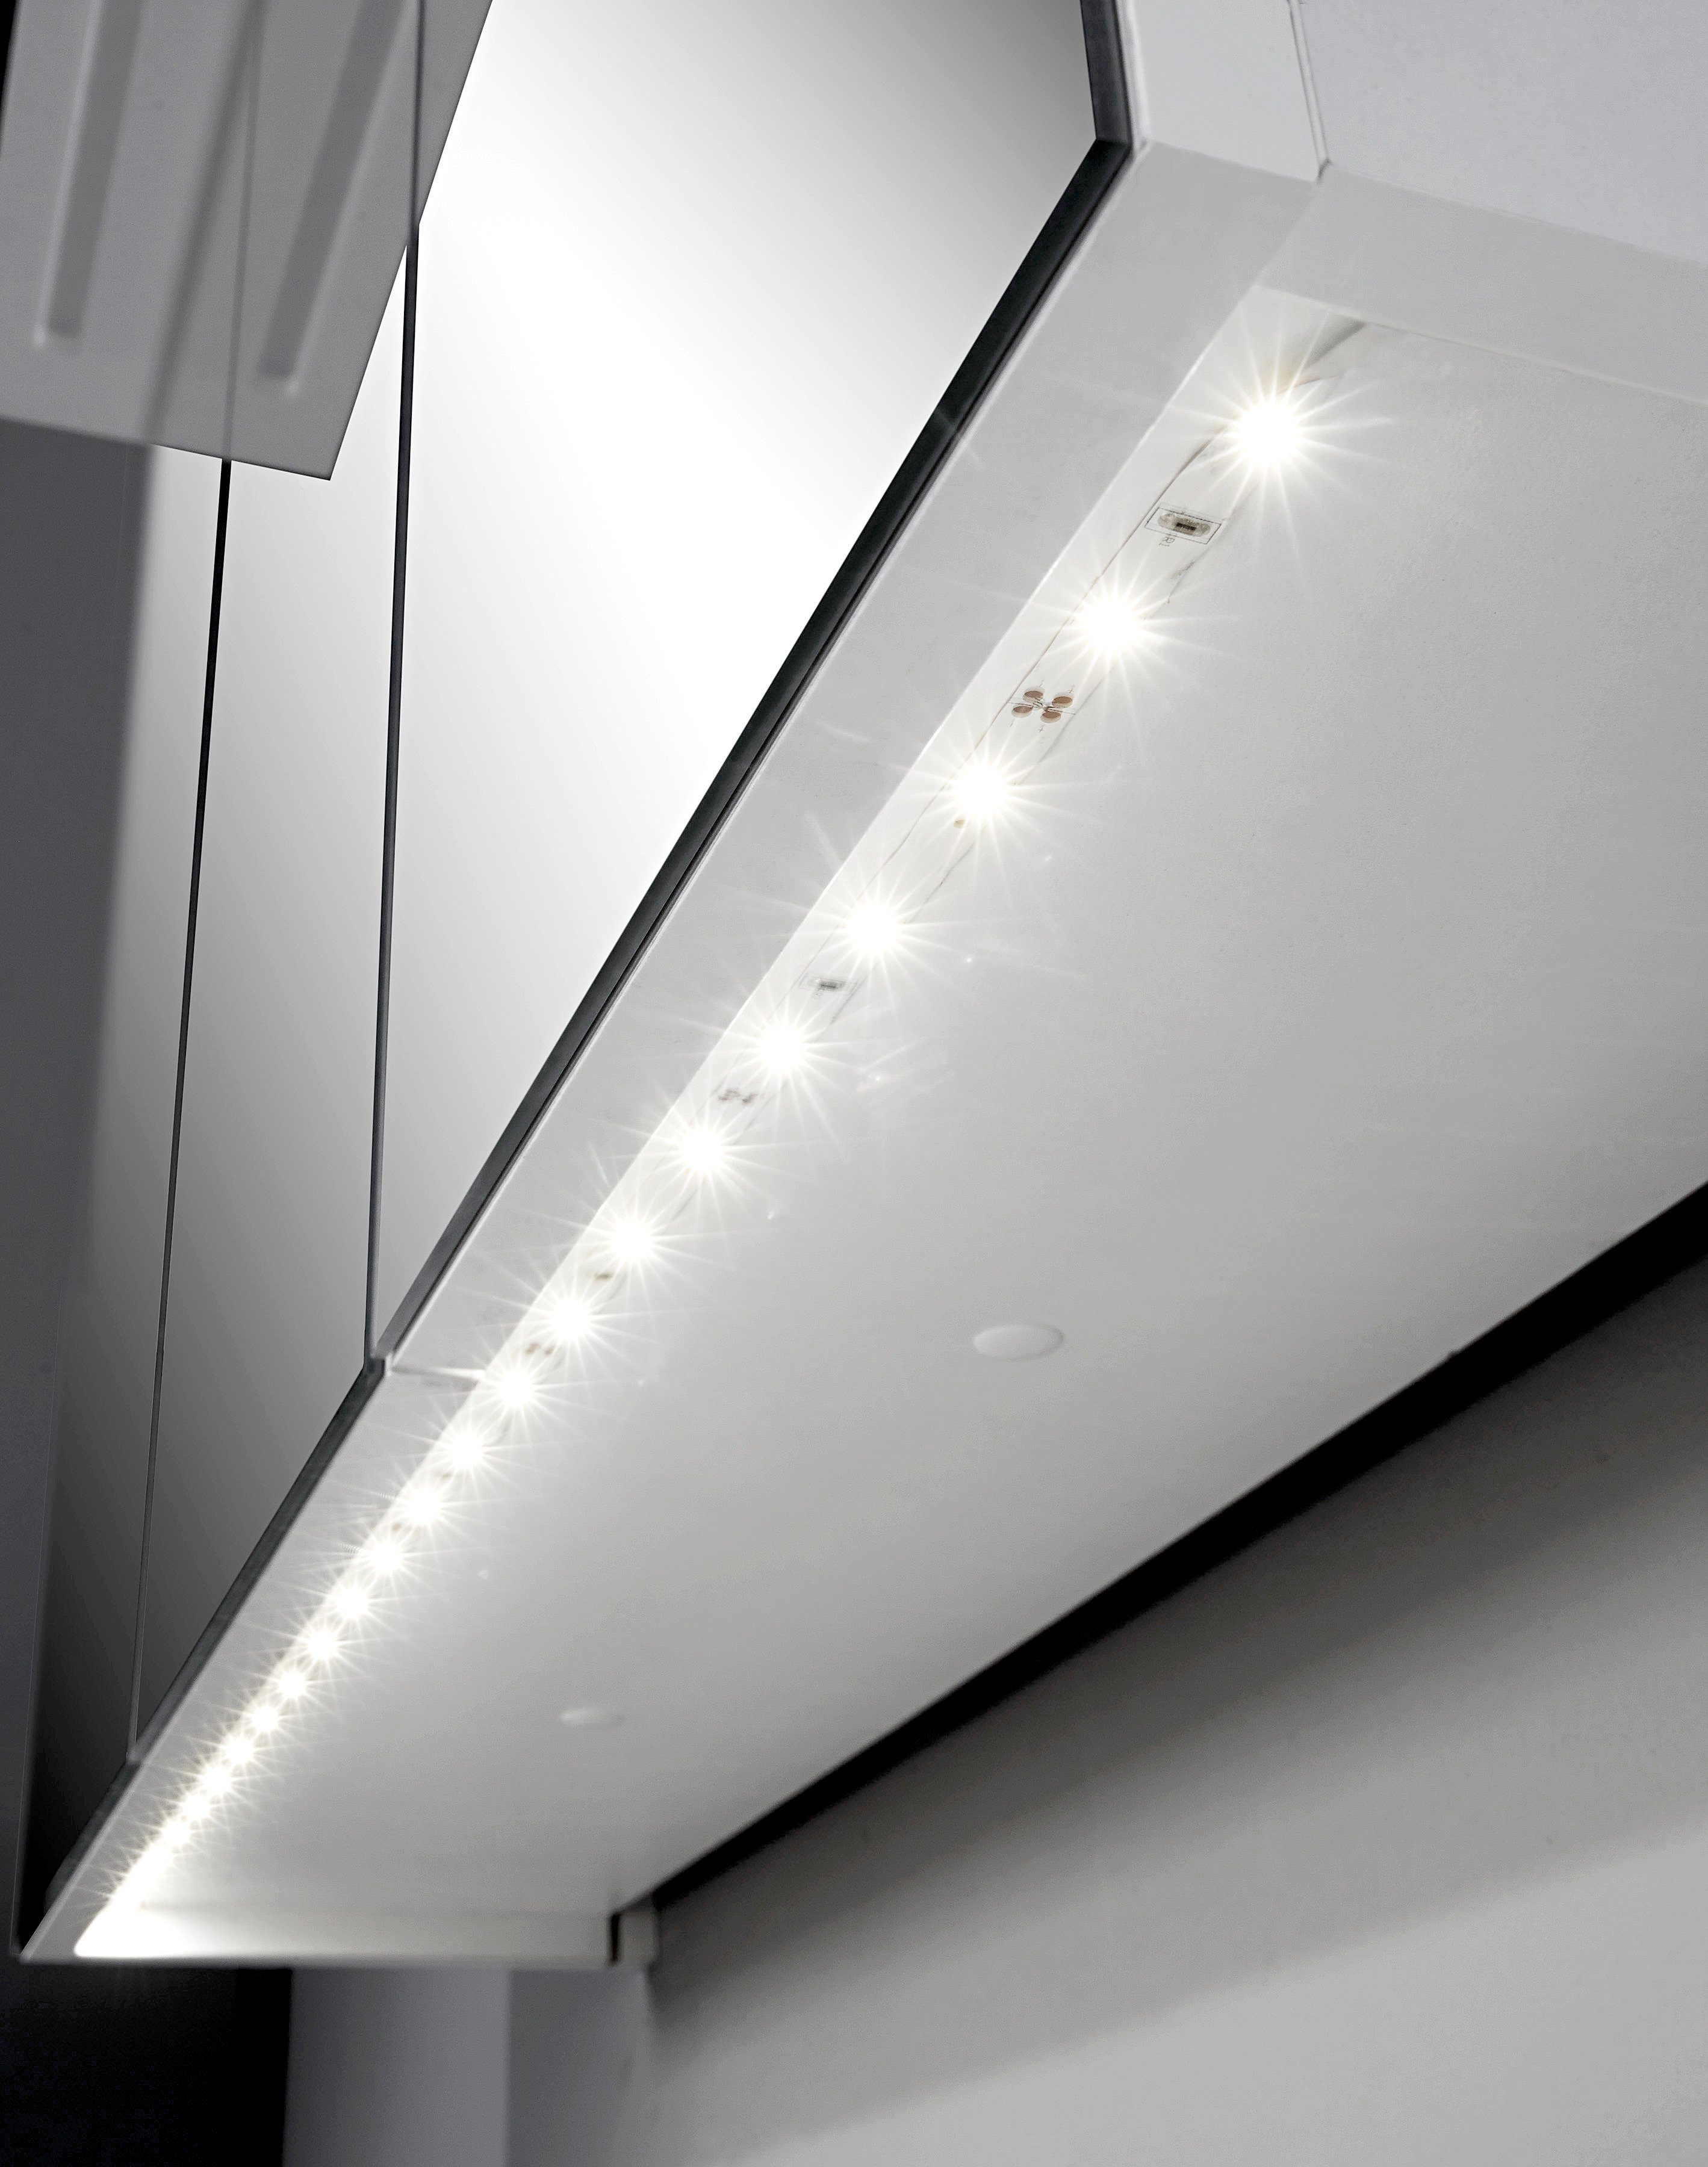 Sehr Gut LED Strips & LED Lichtband online kaufen | OTTO AK93